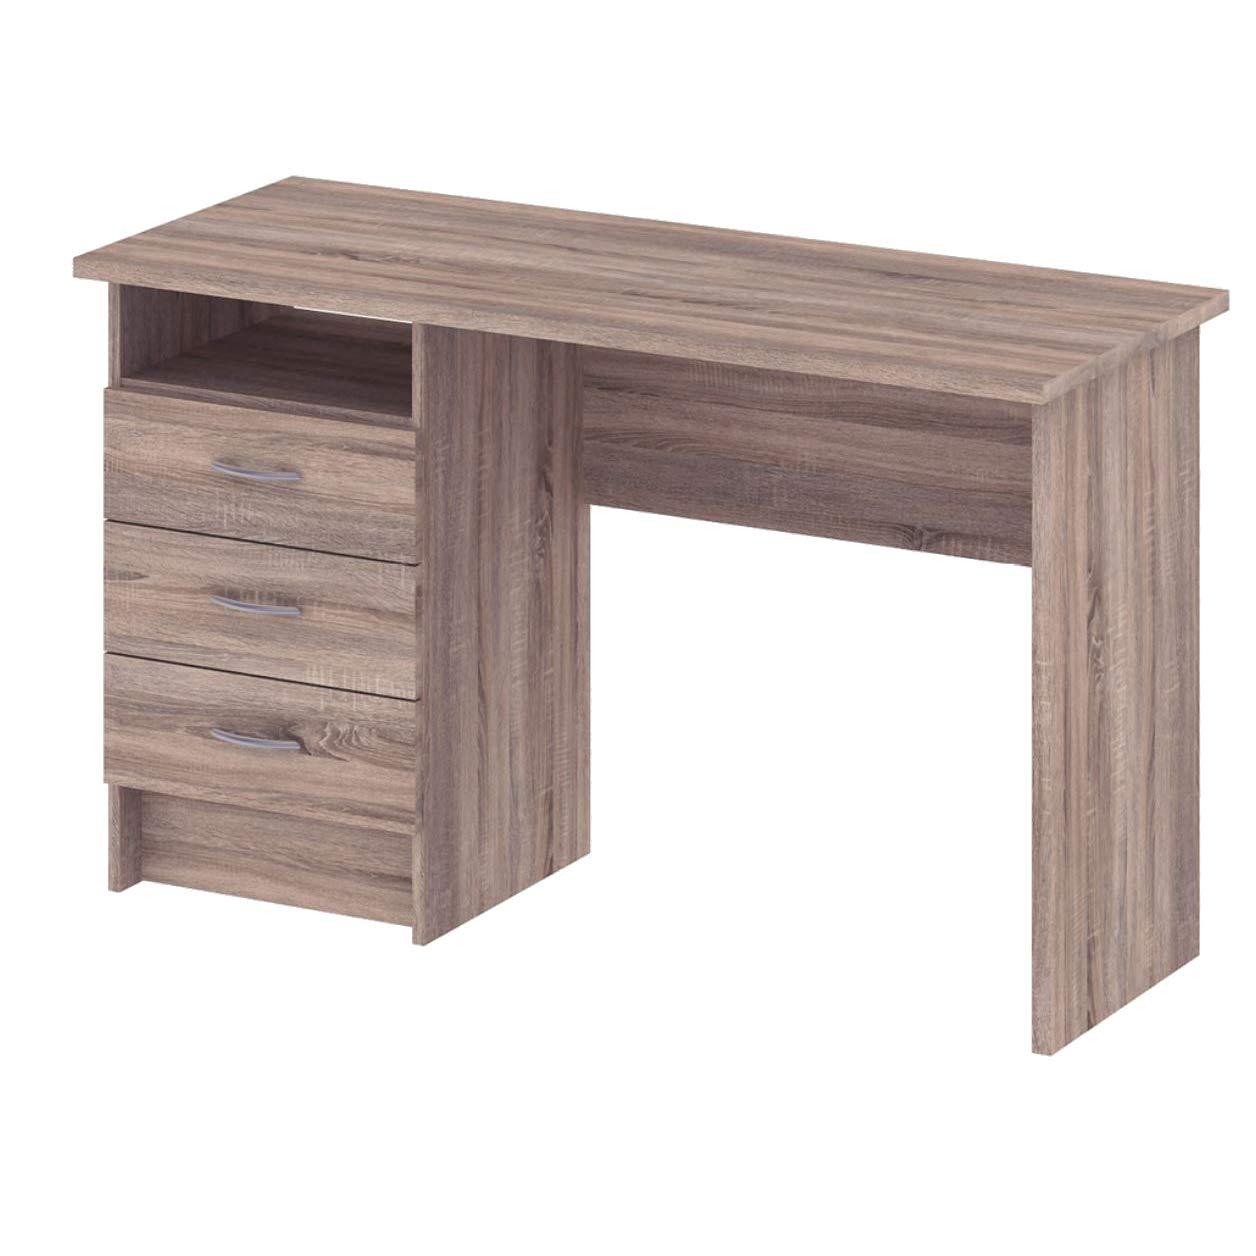 Movian Idro 4-Drawer Desk White Brand 56 x 110 x 73cm